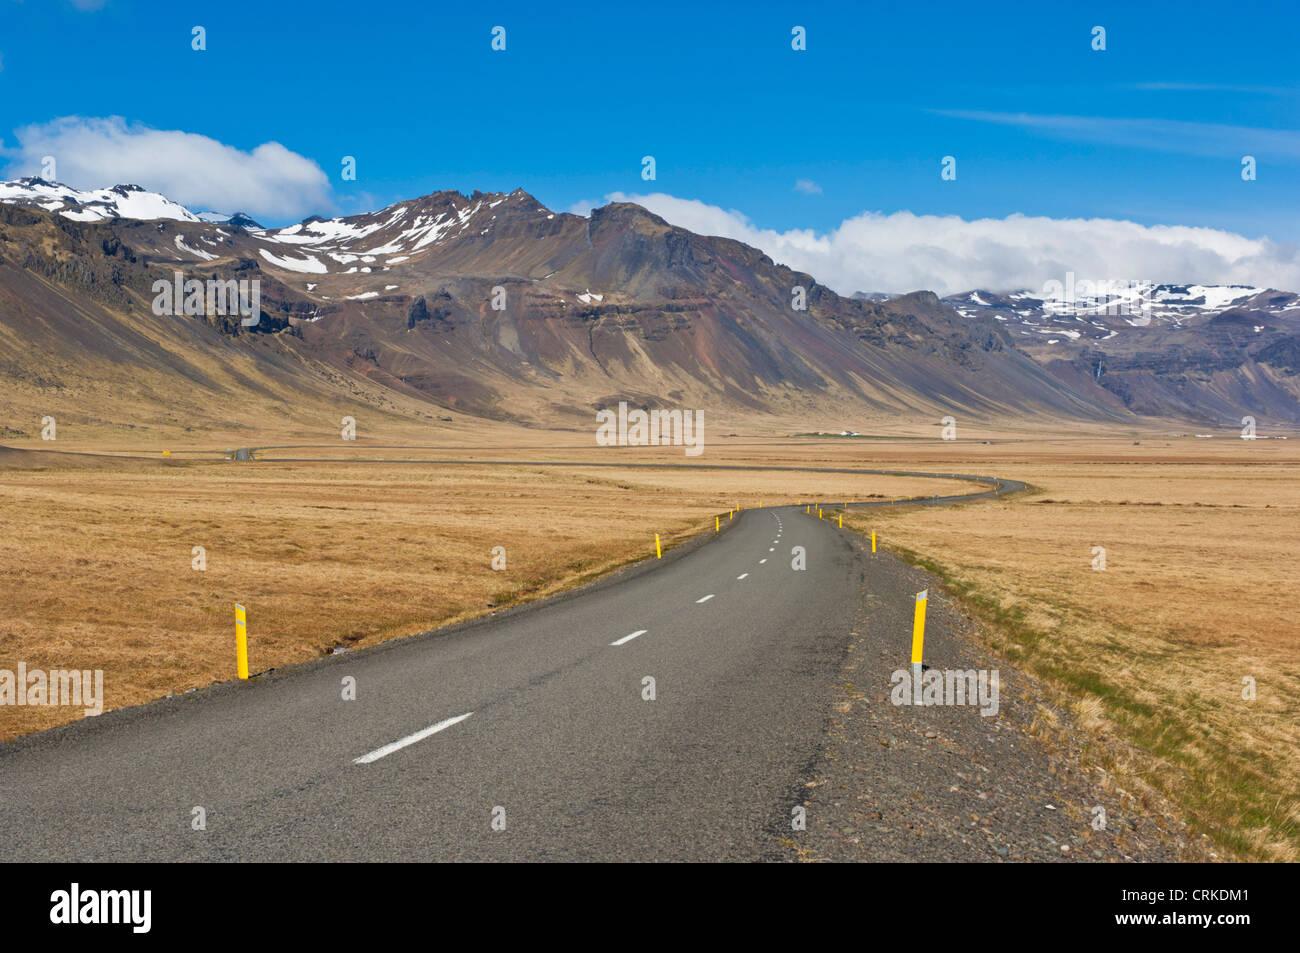 Péninsule de Snæfellsnes à vide, l'Islande de l'Ouest Europe de l'UE Photo Stock